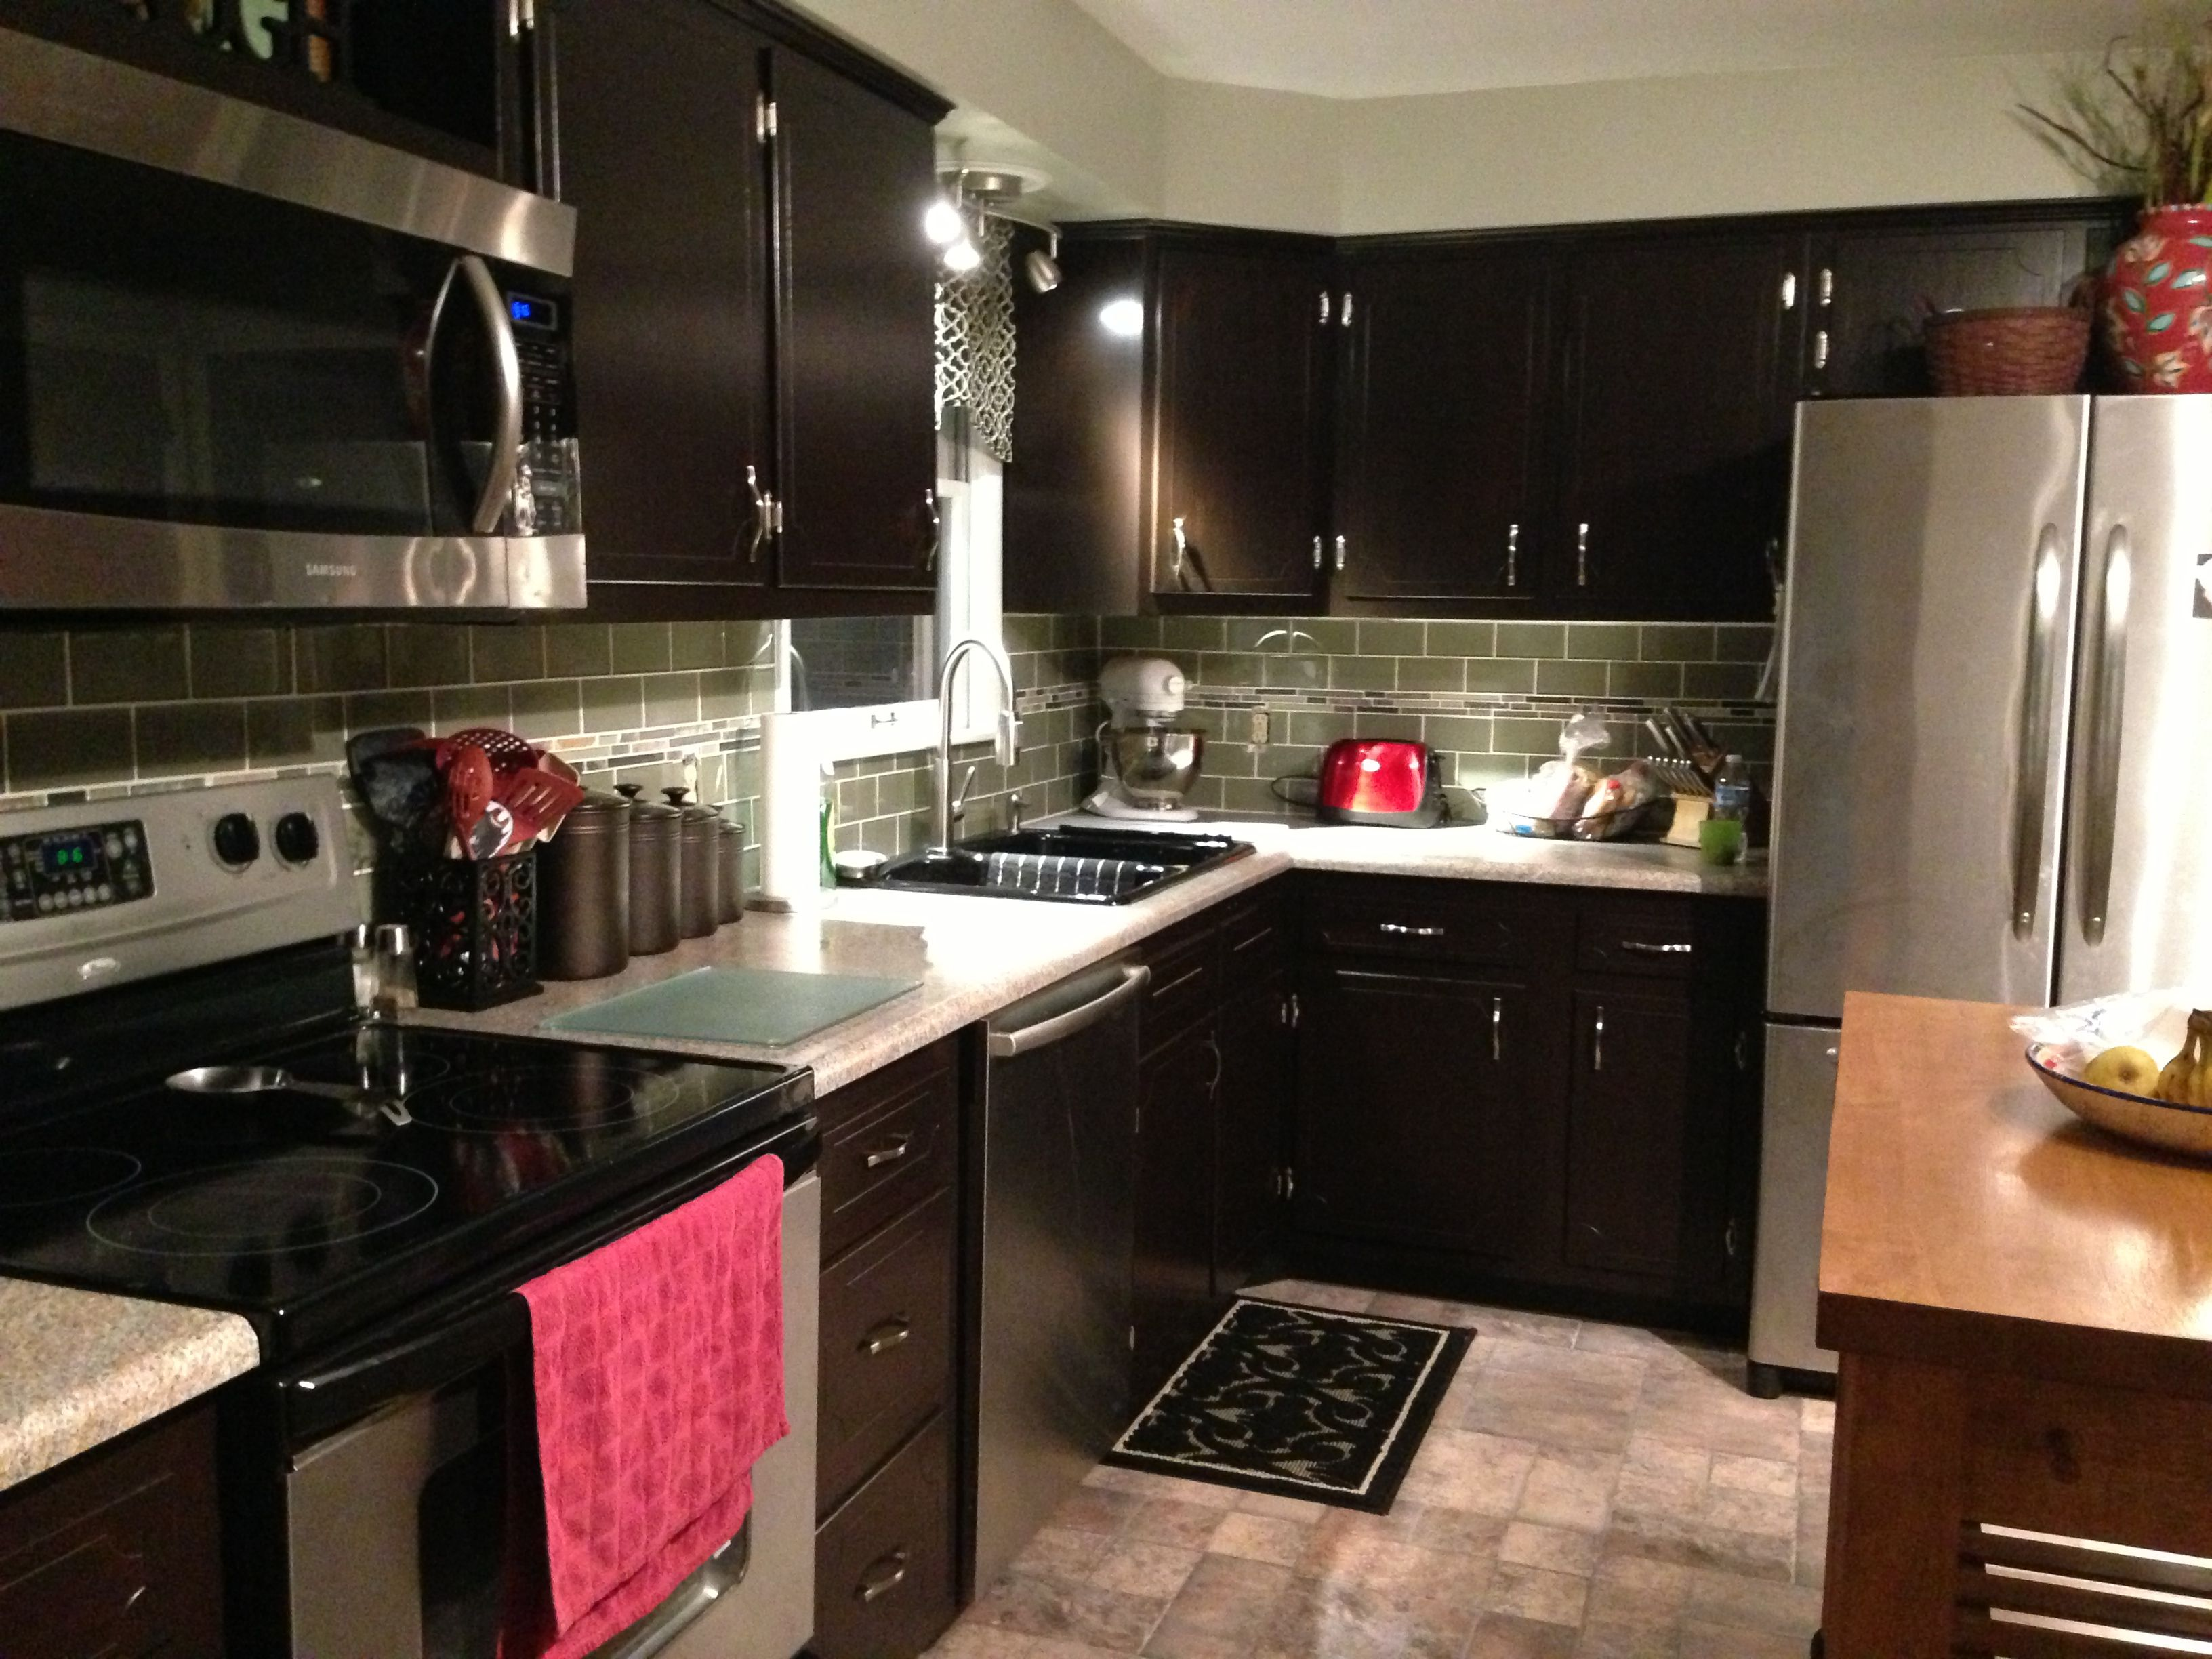 Kitchen Remodel Java Gel Stain Cabinets Backsplash Glass Subway Tile With Glass Mosiac Strip Kitchen Remodel Kitchen Renovation Kitchen Inspirations